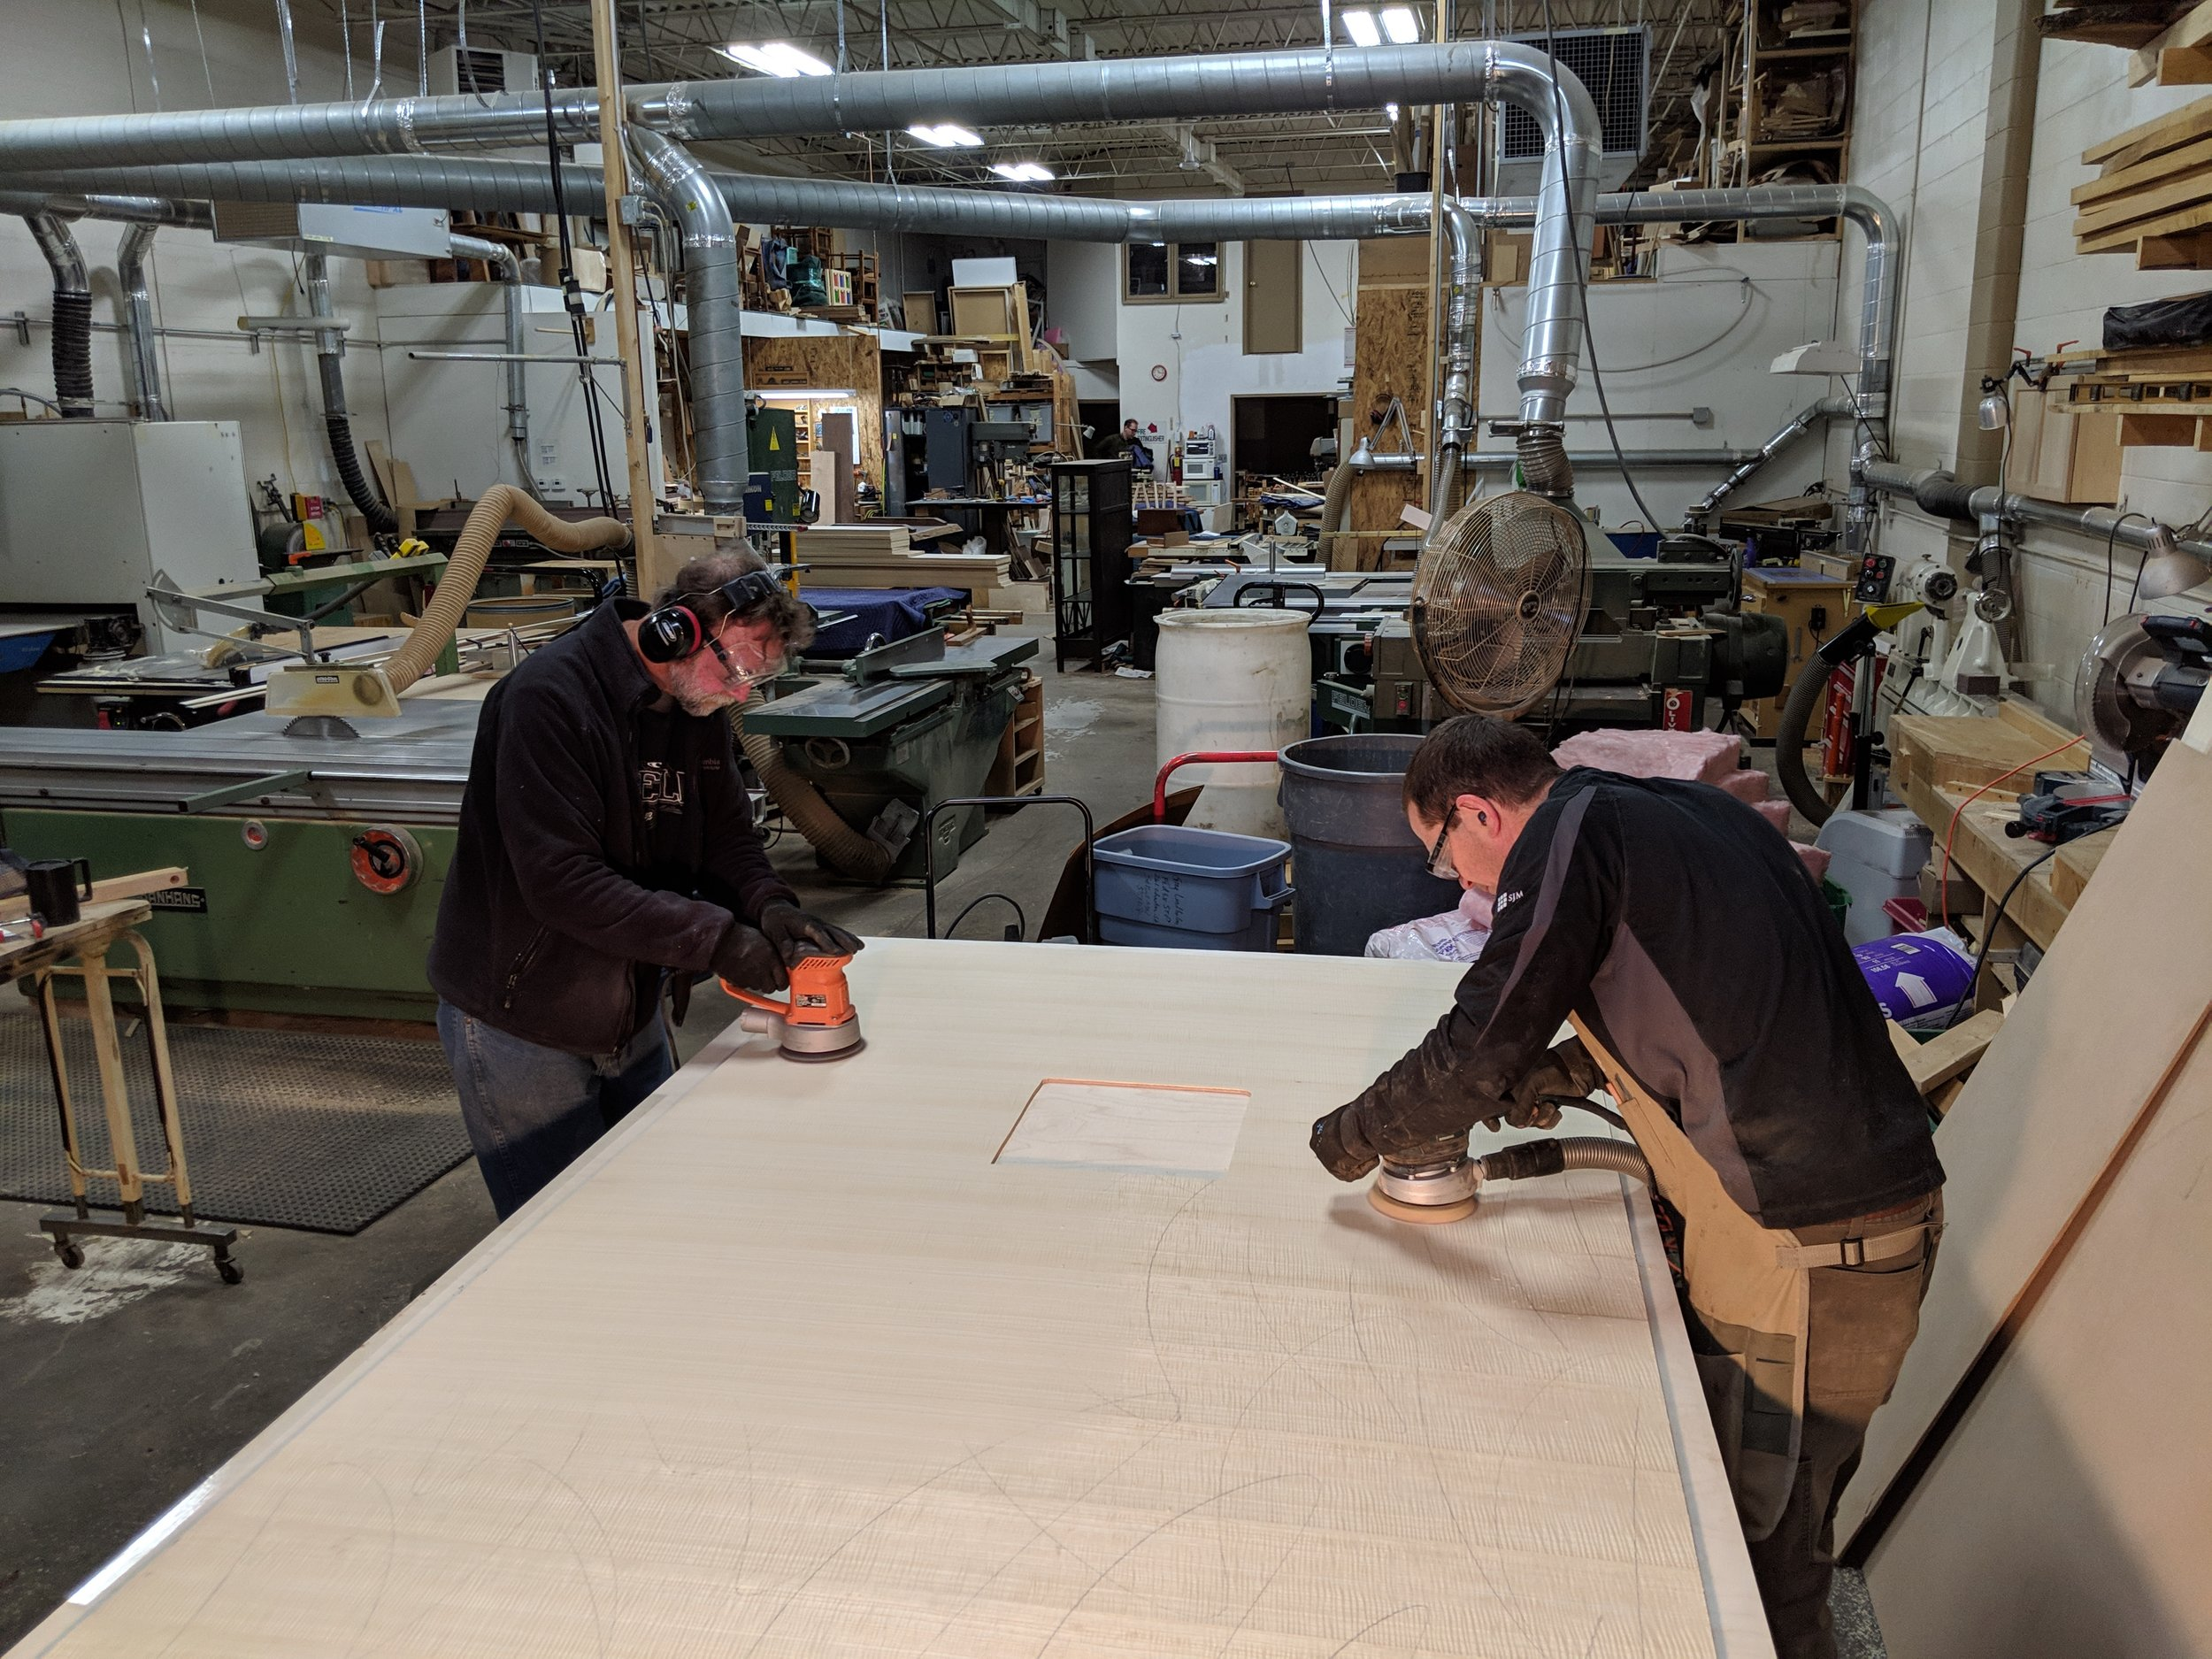 Sanding the panels